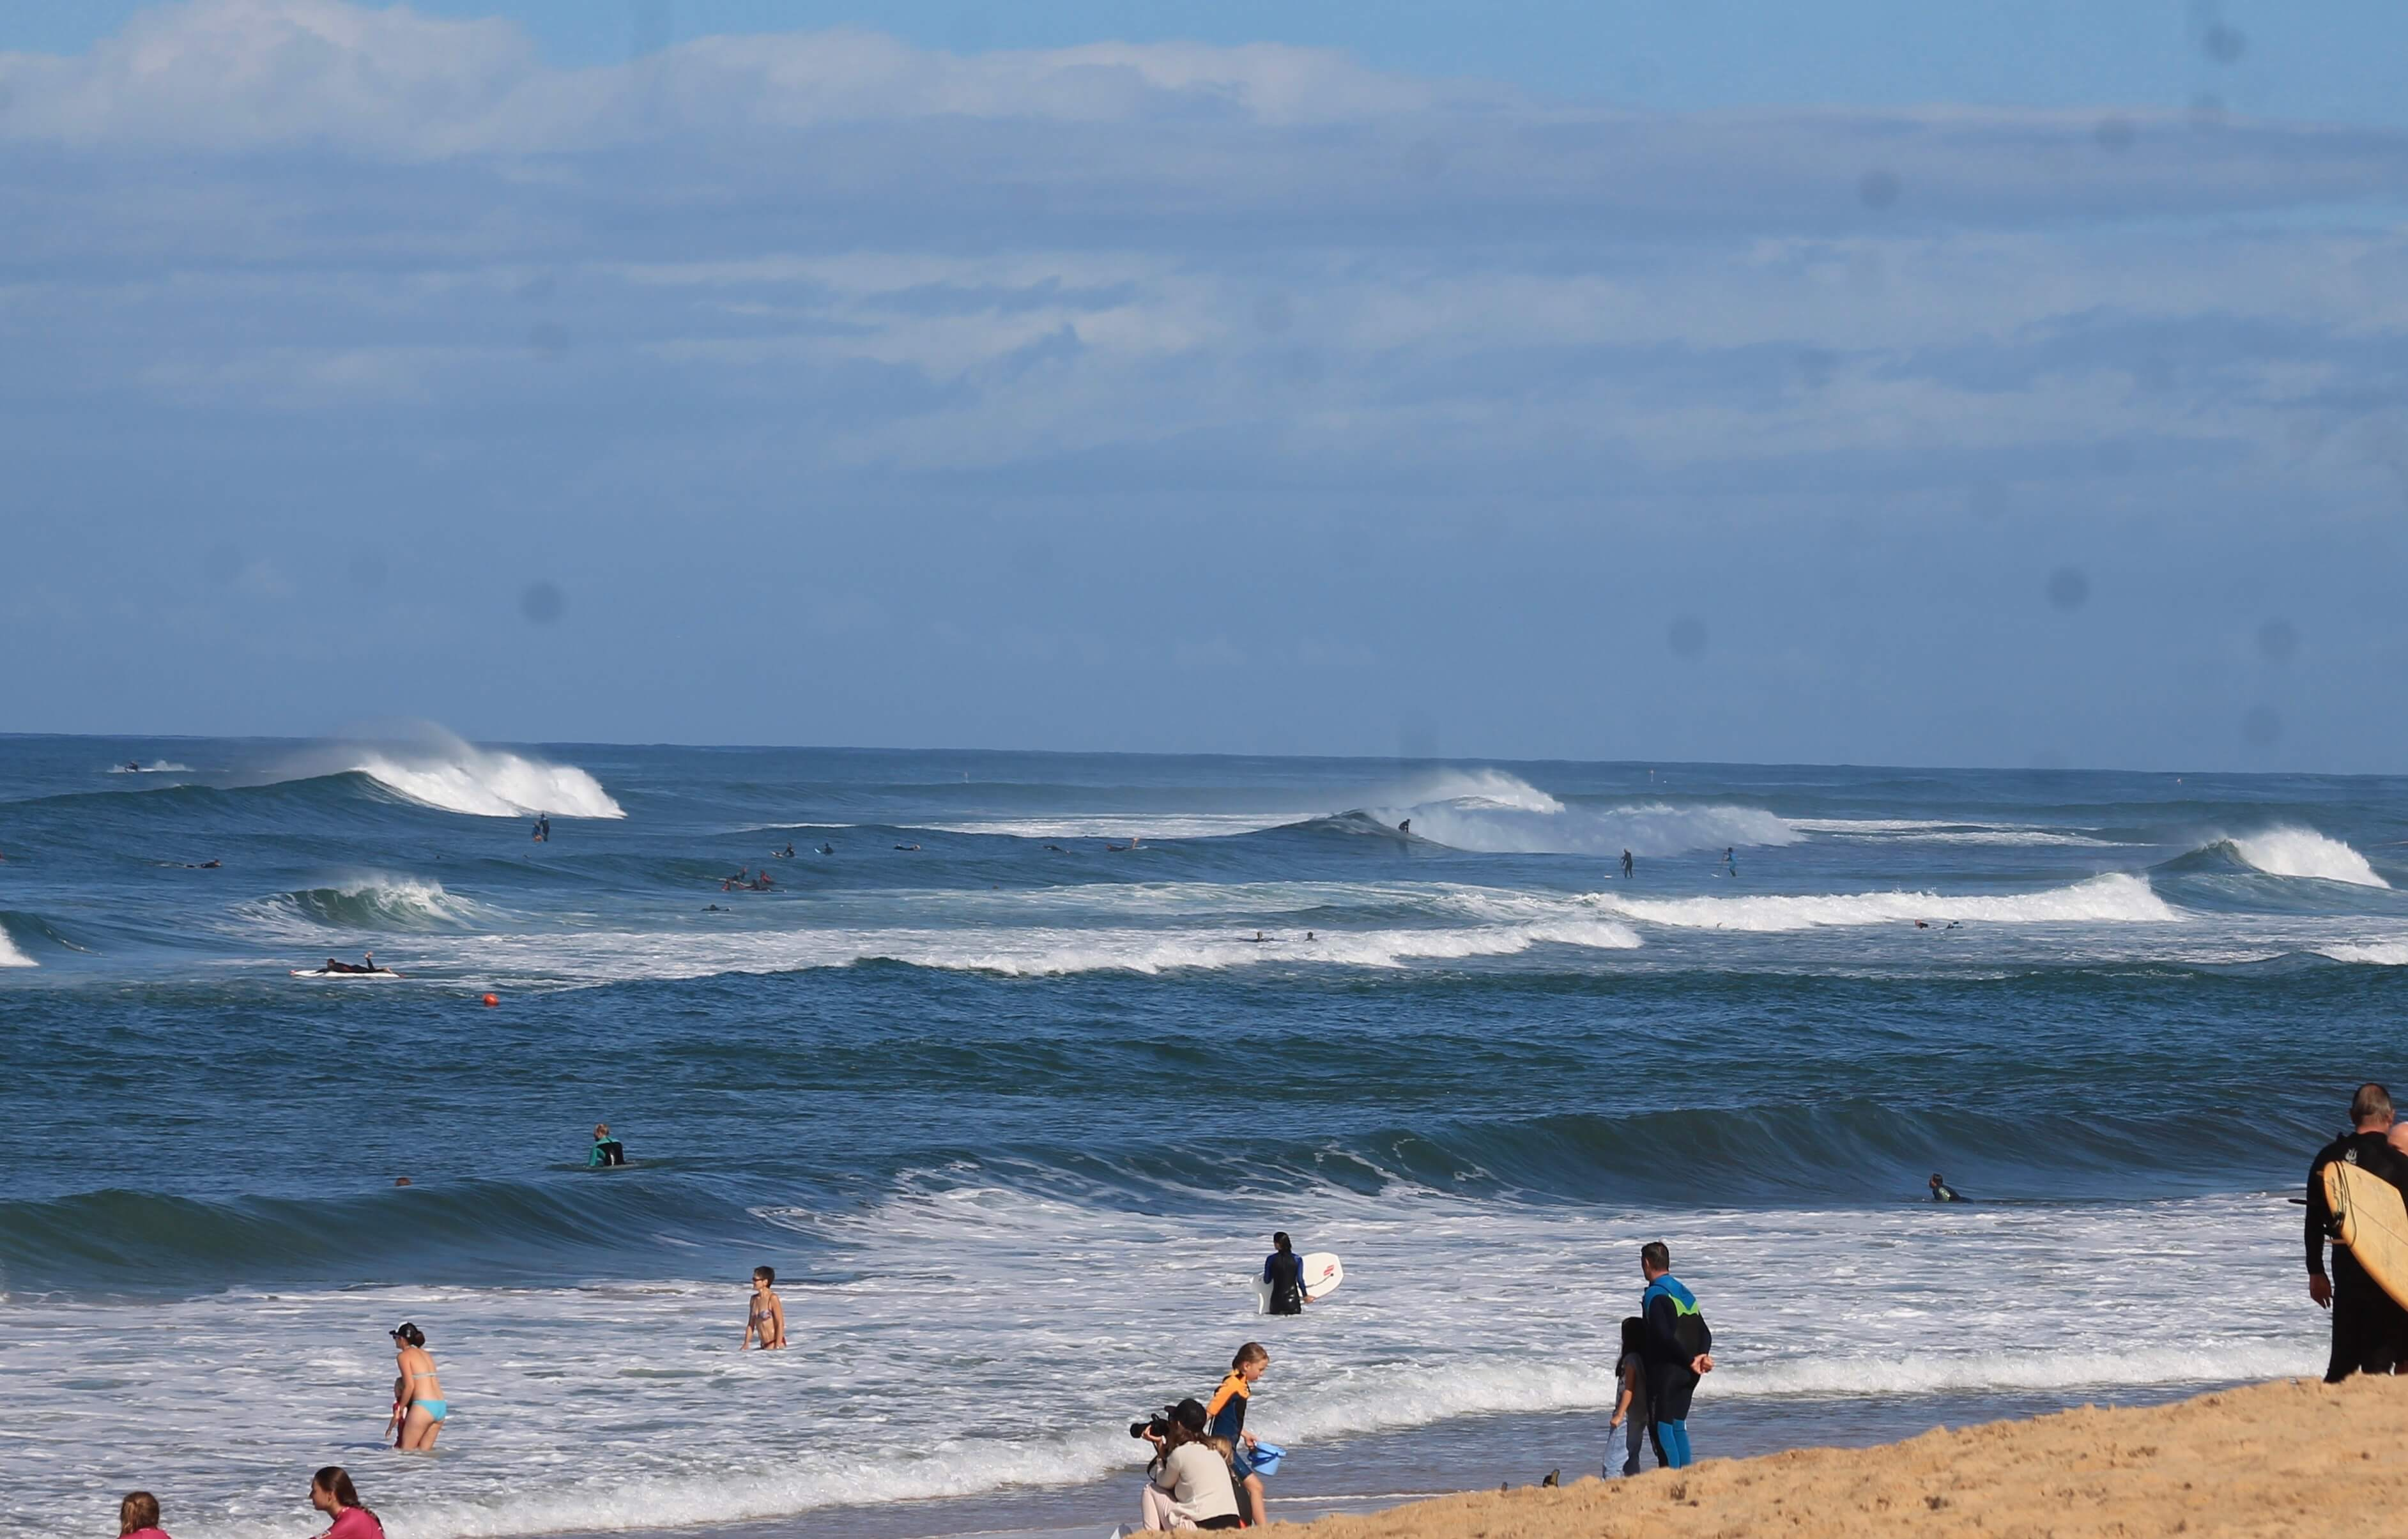 La Nord, Guide to Surfing Hossegor, France